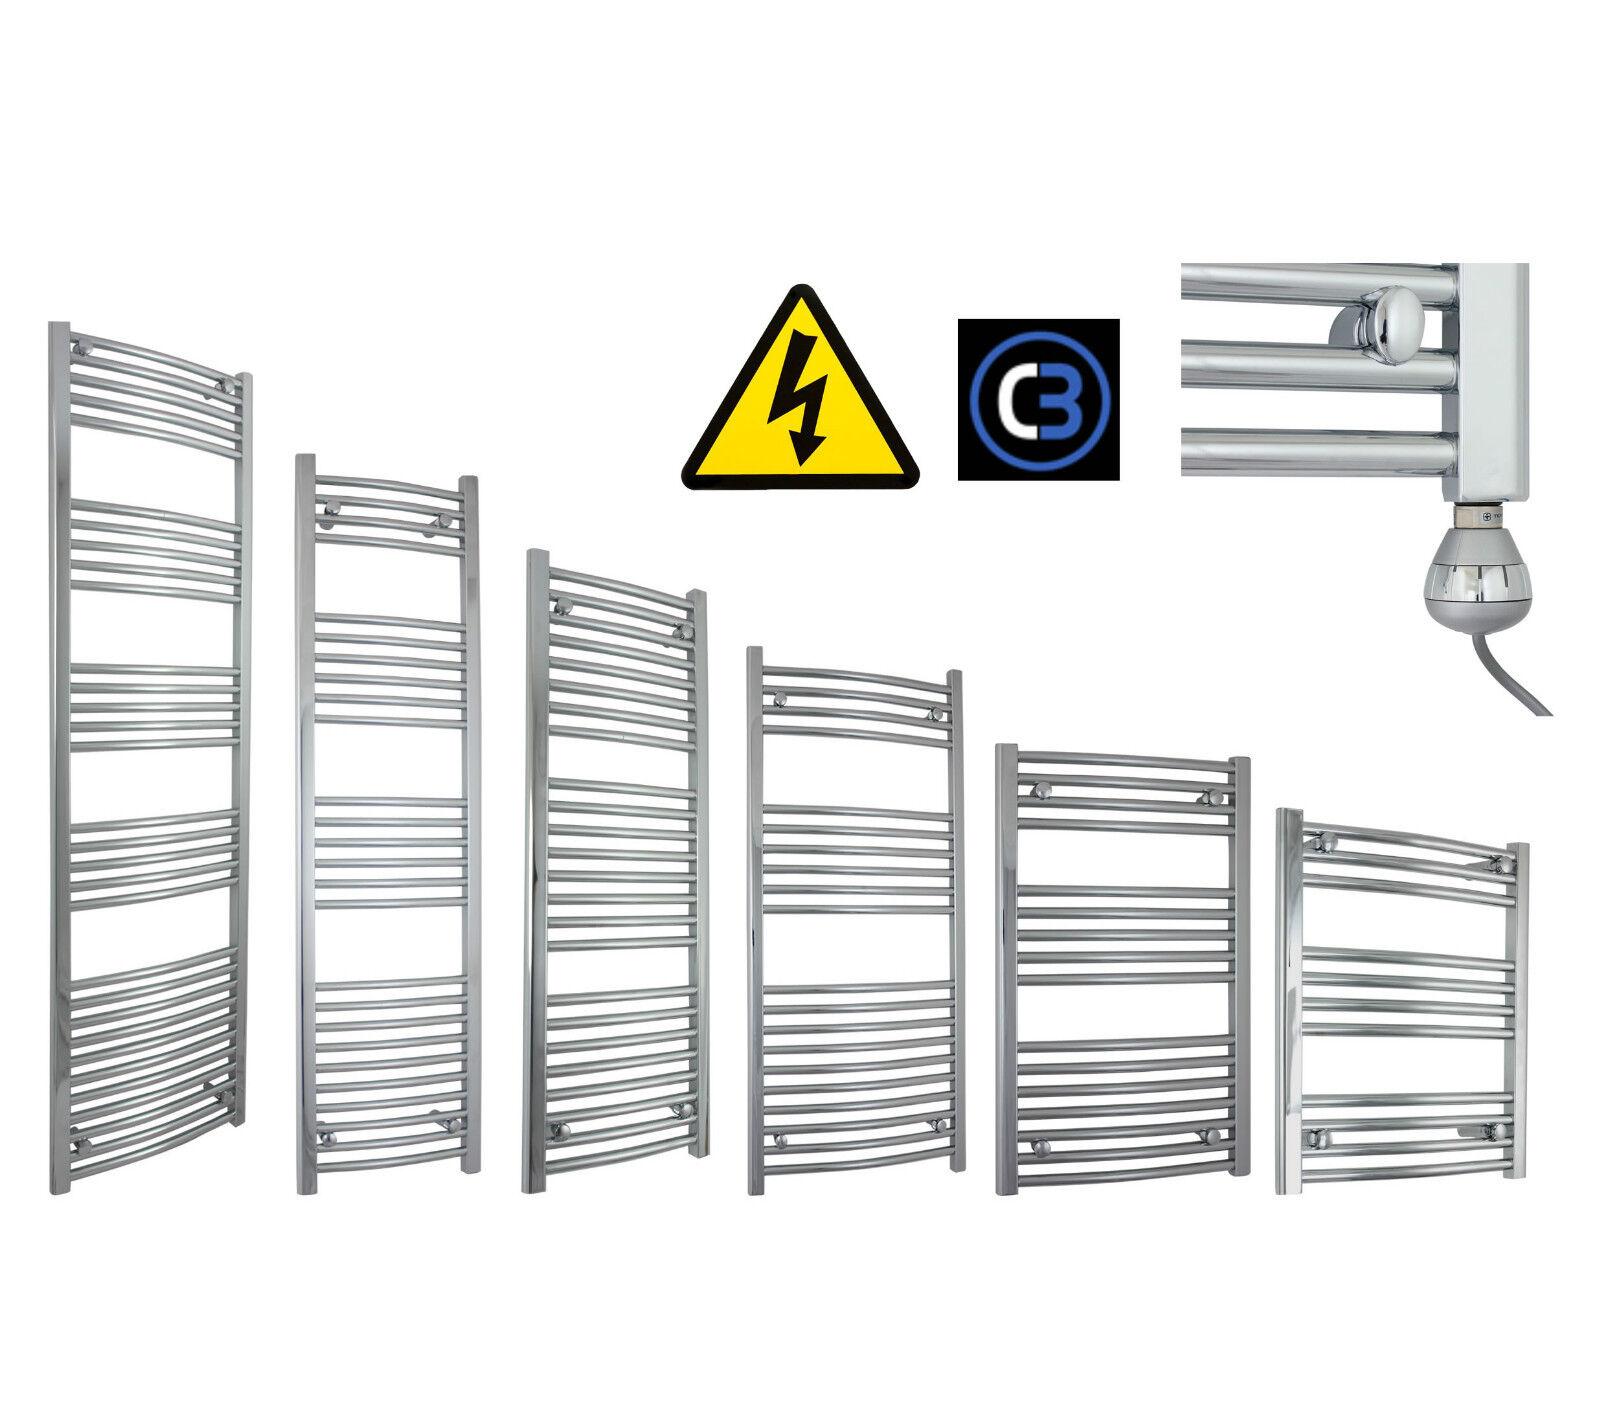 600mm Wide Chrome Electric Heated Towel Rail Radiator